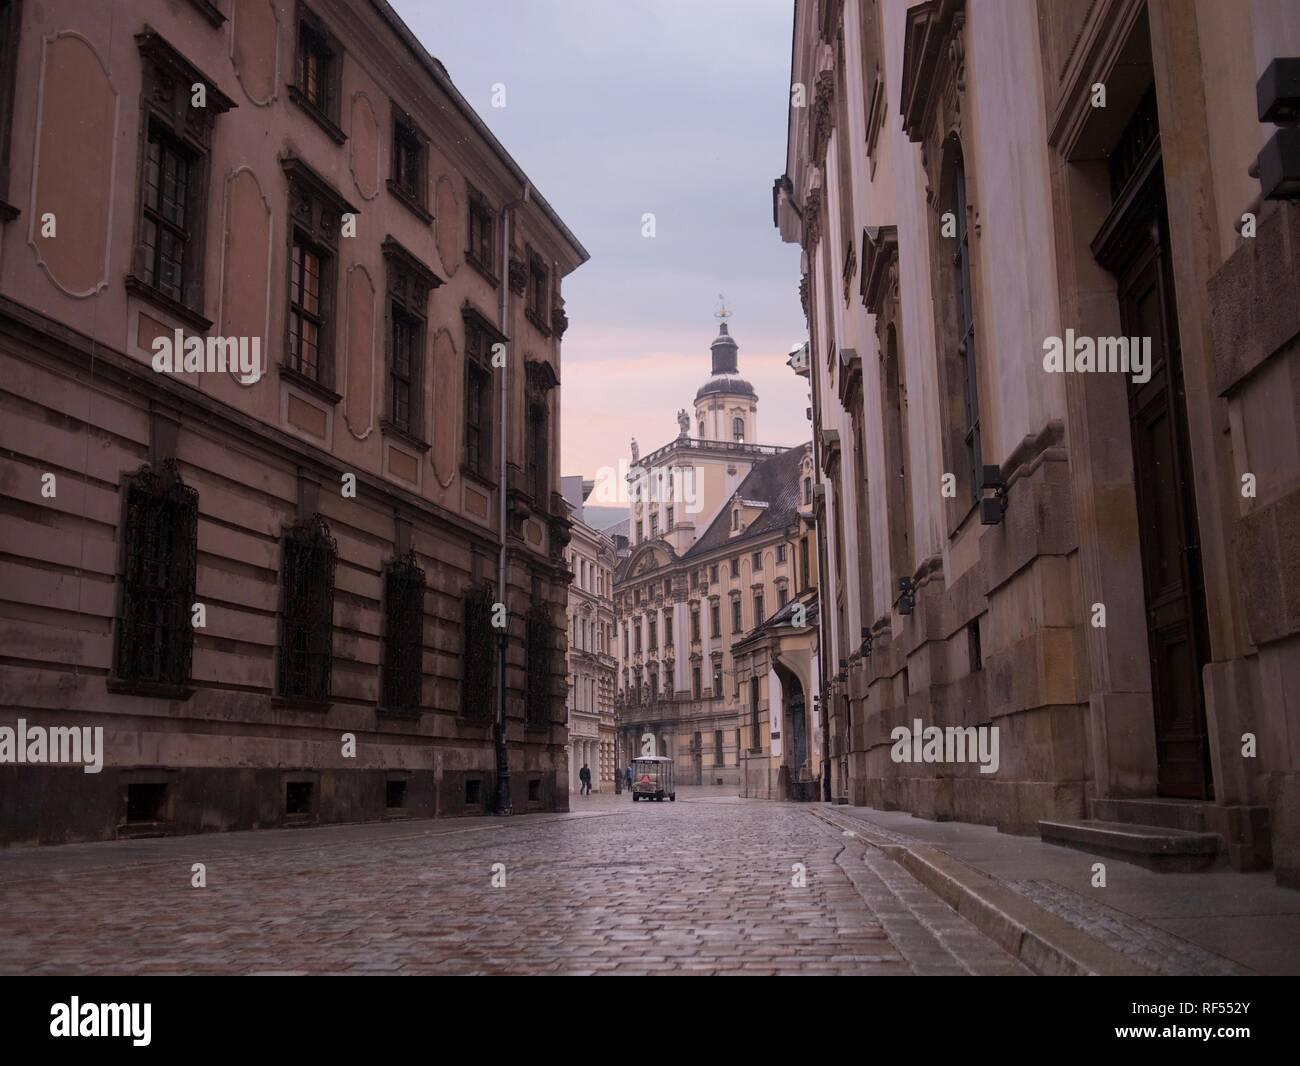 Baroque Architecture, Cobblestone Sidewalk and Light Snow Falling - Stock Image